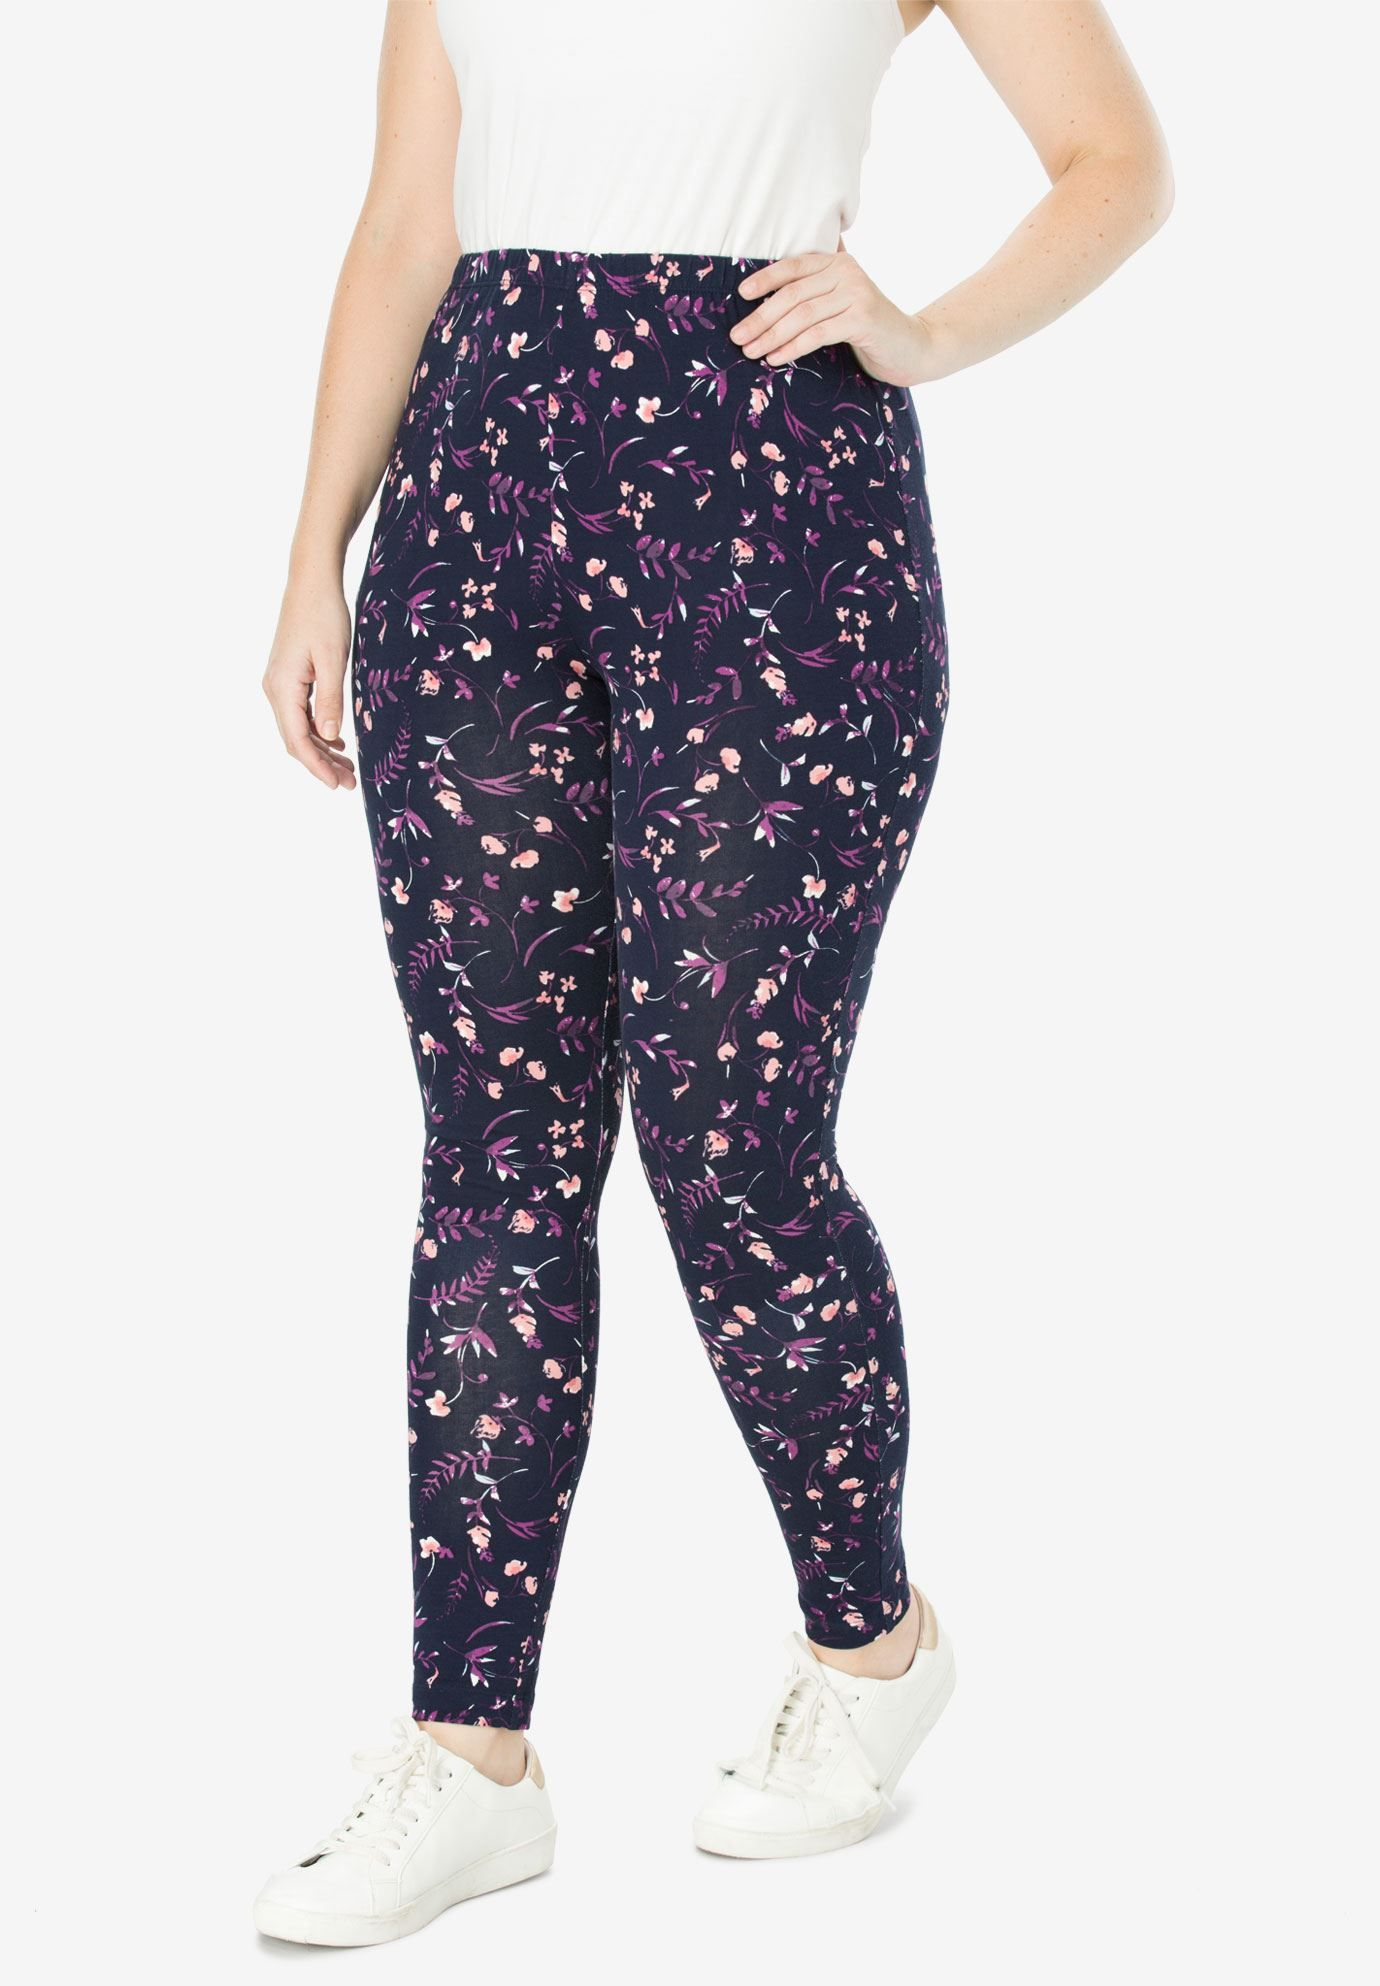 776ac668066 Stretch Cotton Printed Legging - Women s Plus Size Clothing ...